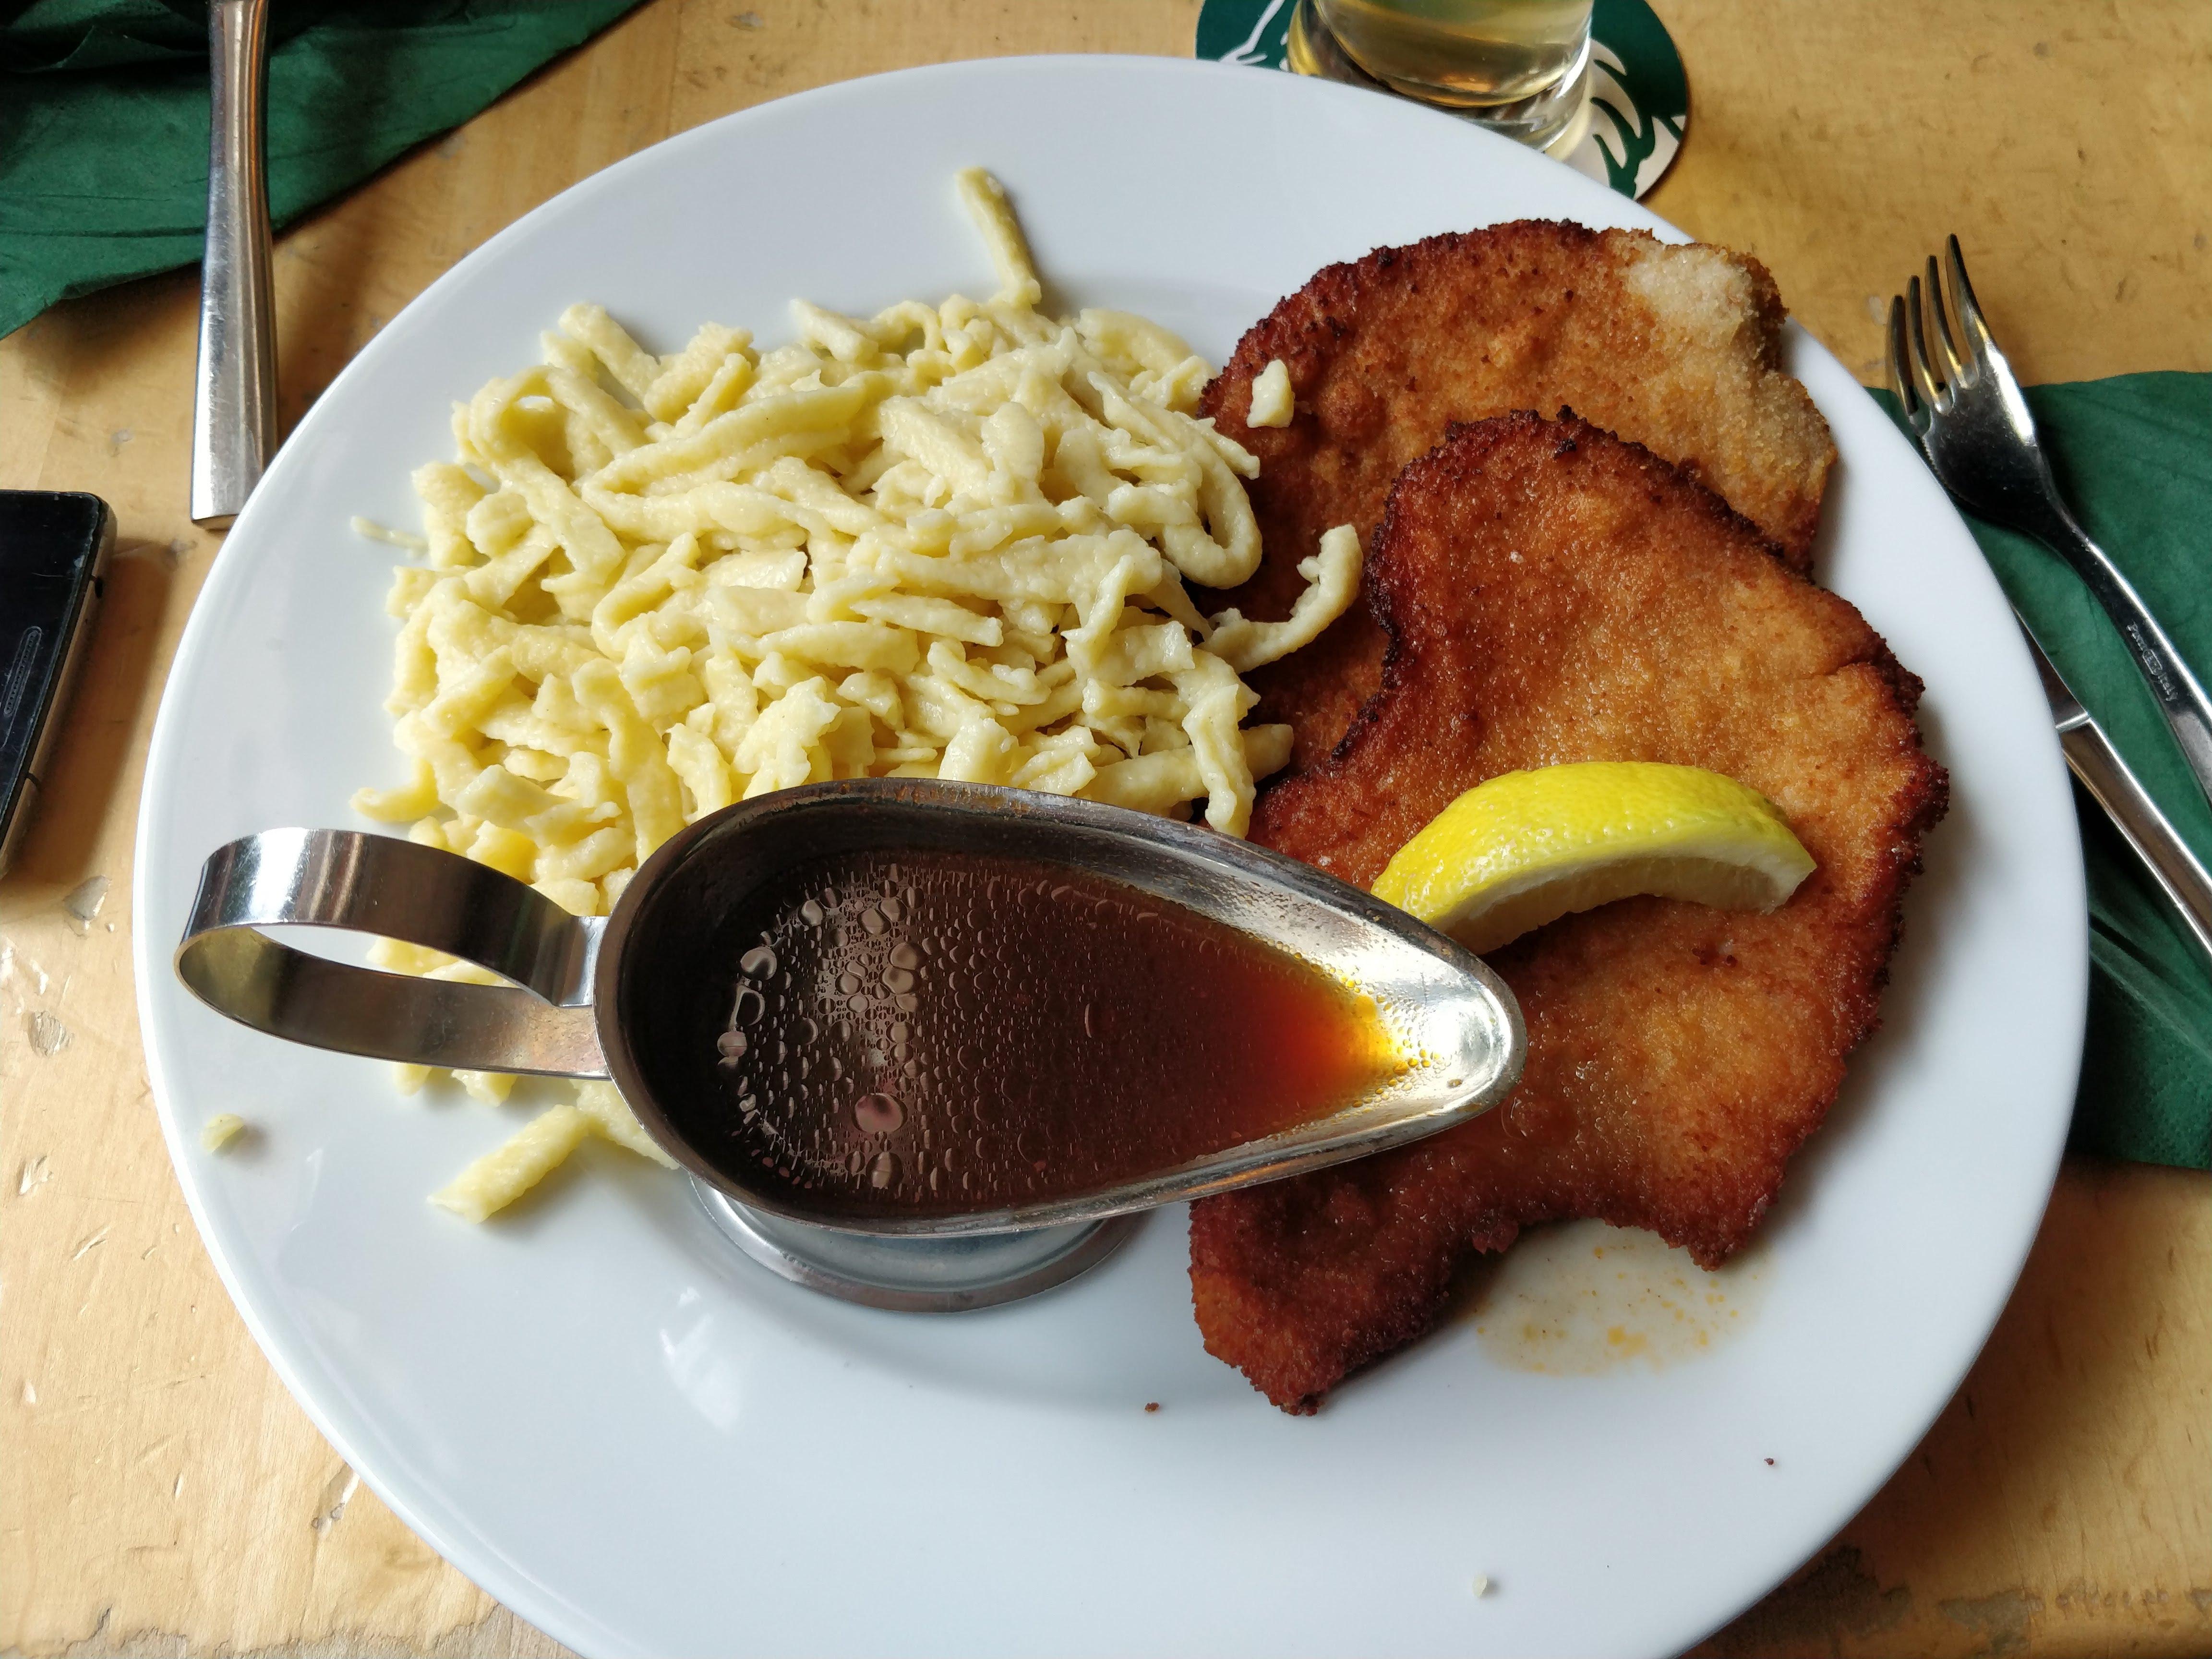 http://foodloader.net/nico_2018-05-11_panierte-schnitzel-mit-spaetzle.jpg